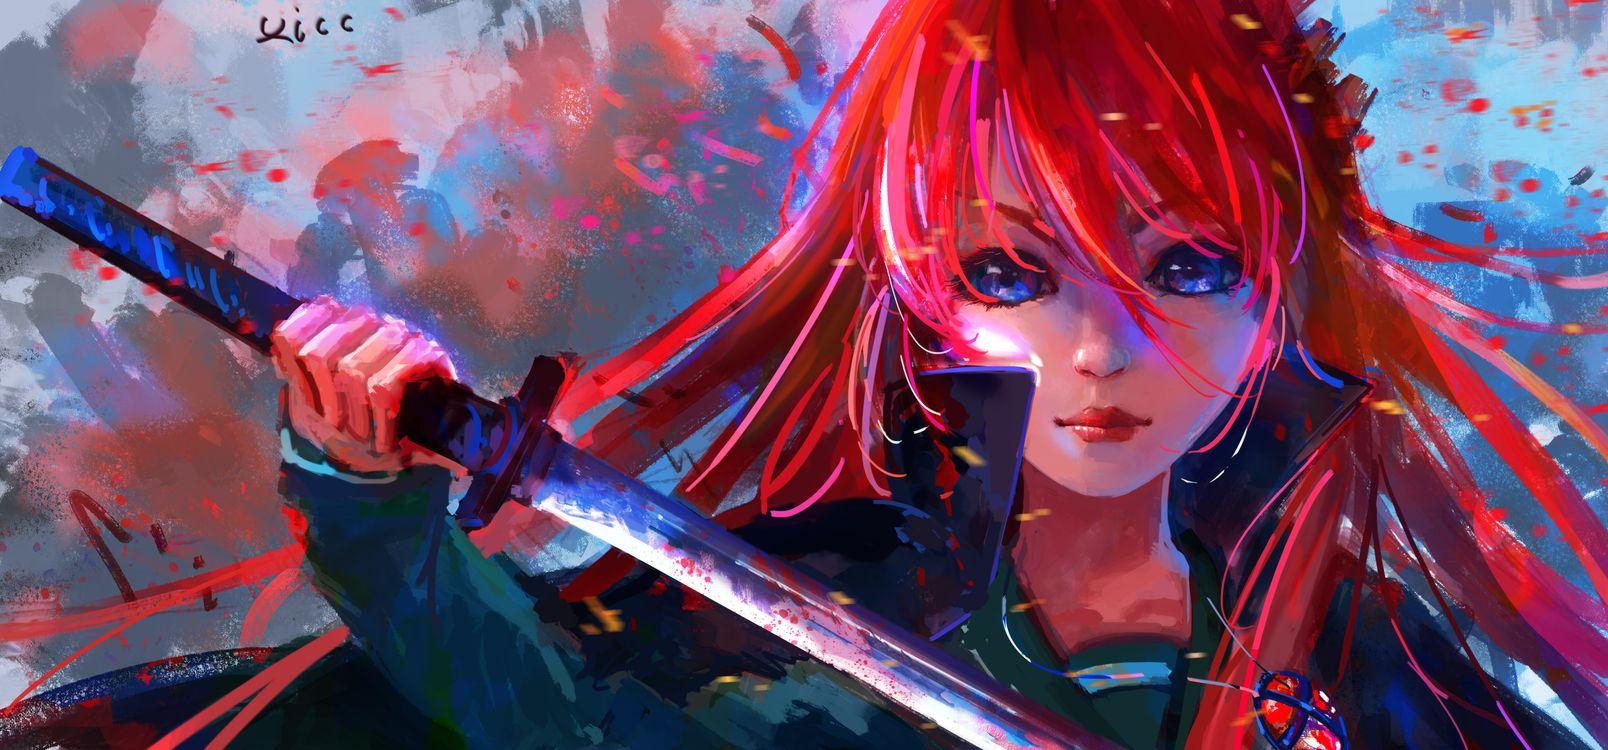 Screensaver anime girls, anime download free